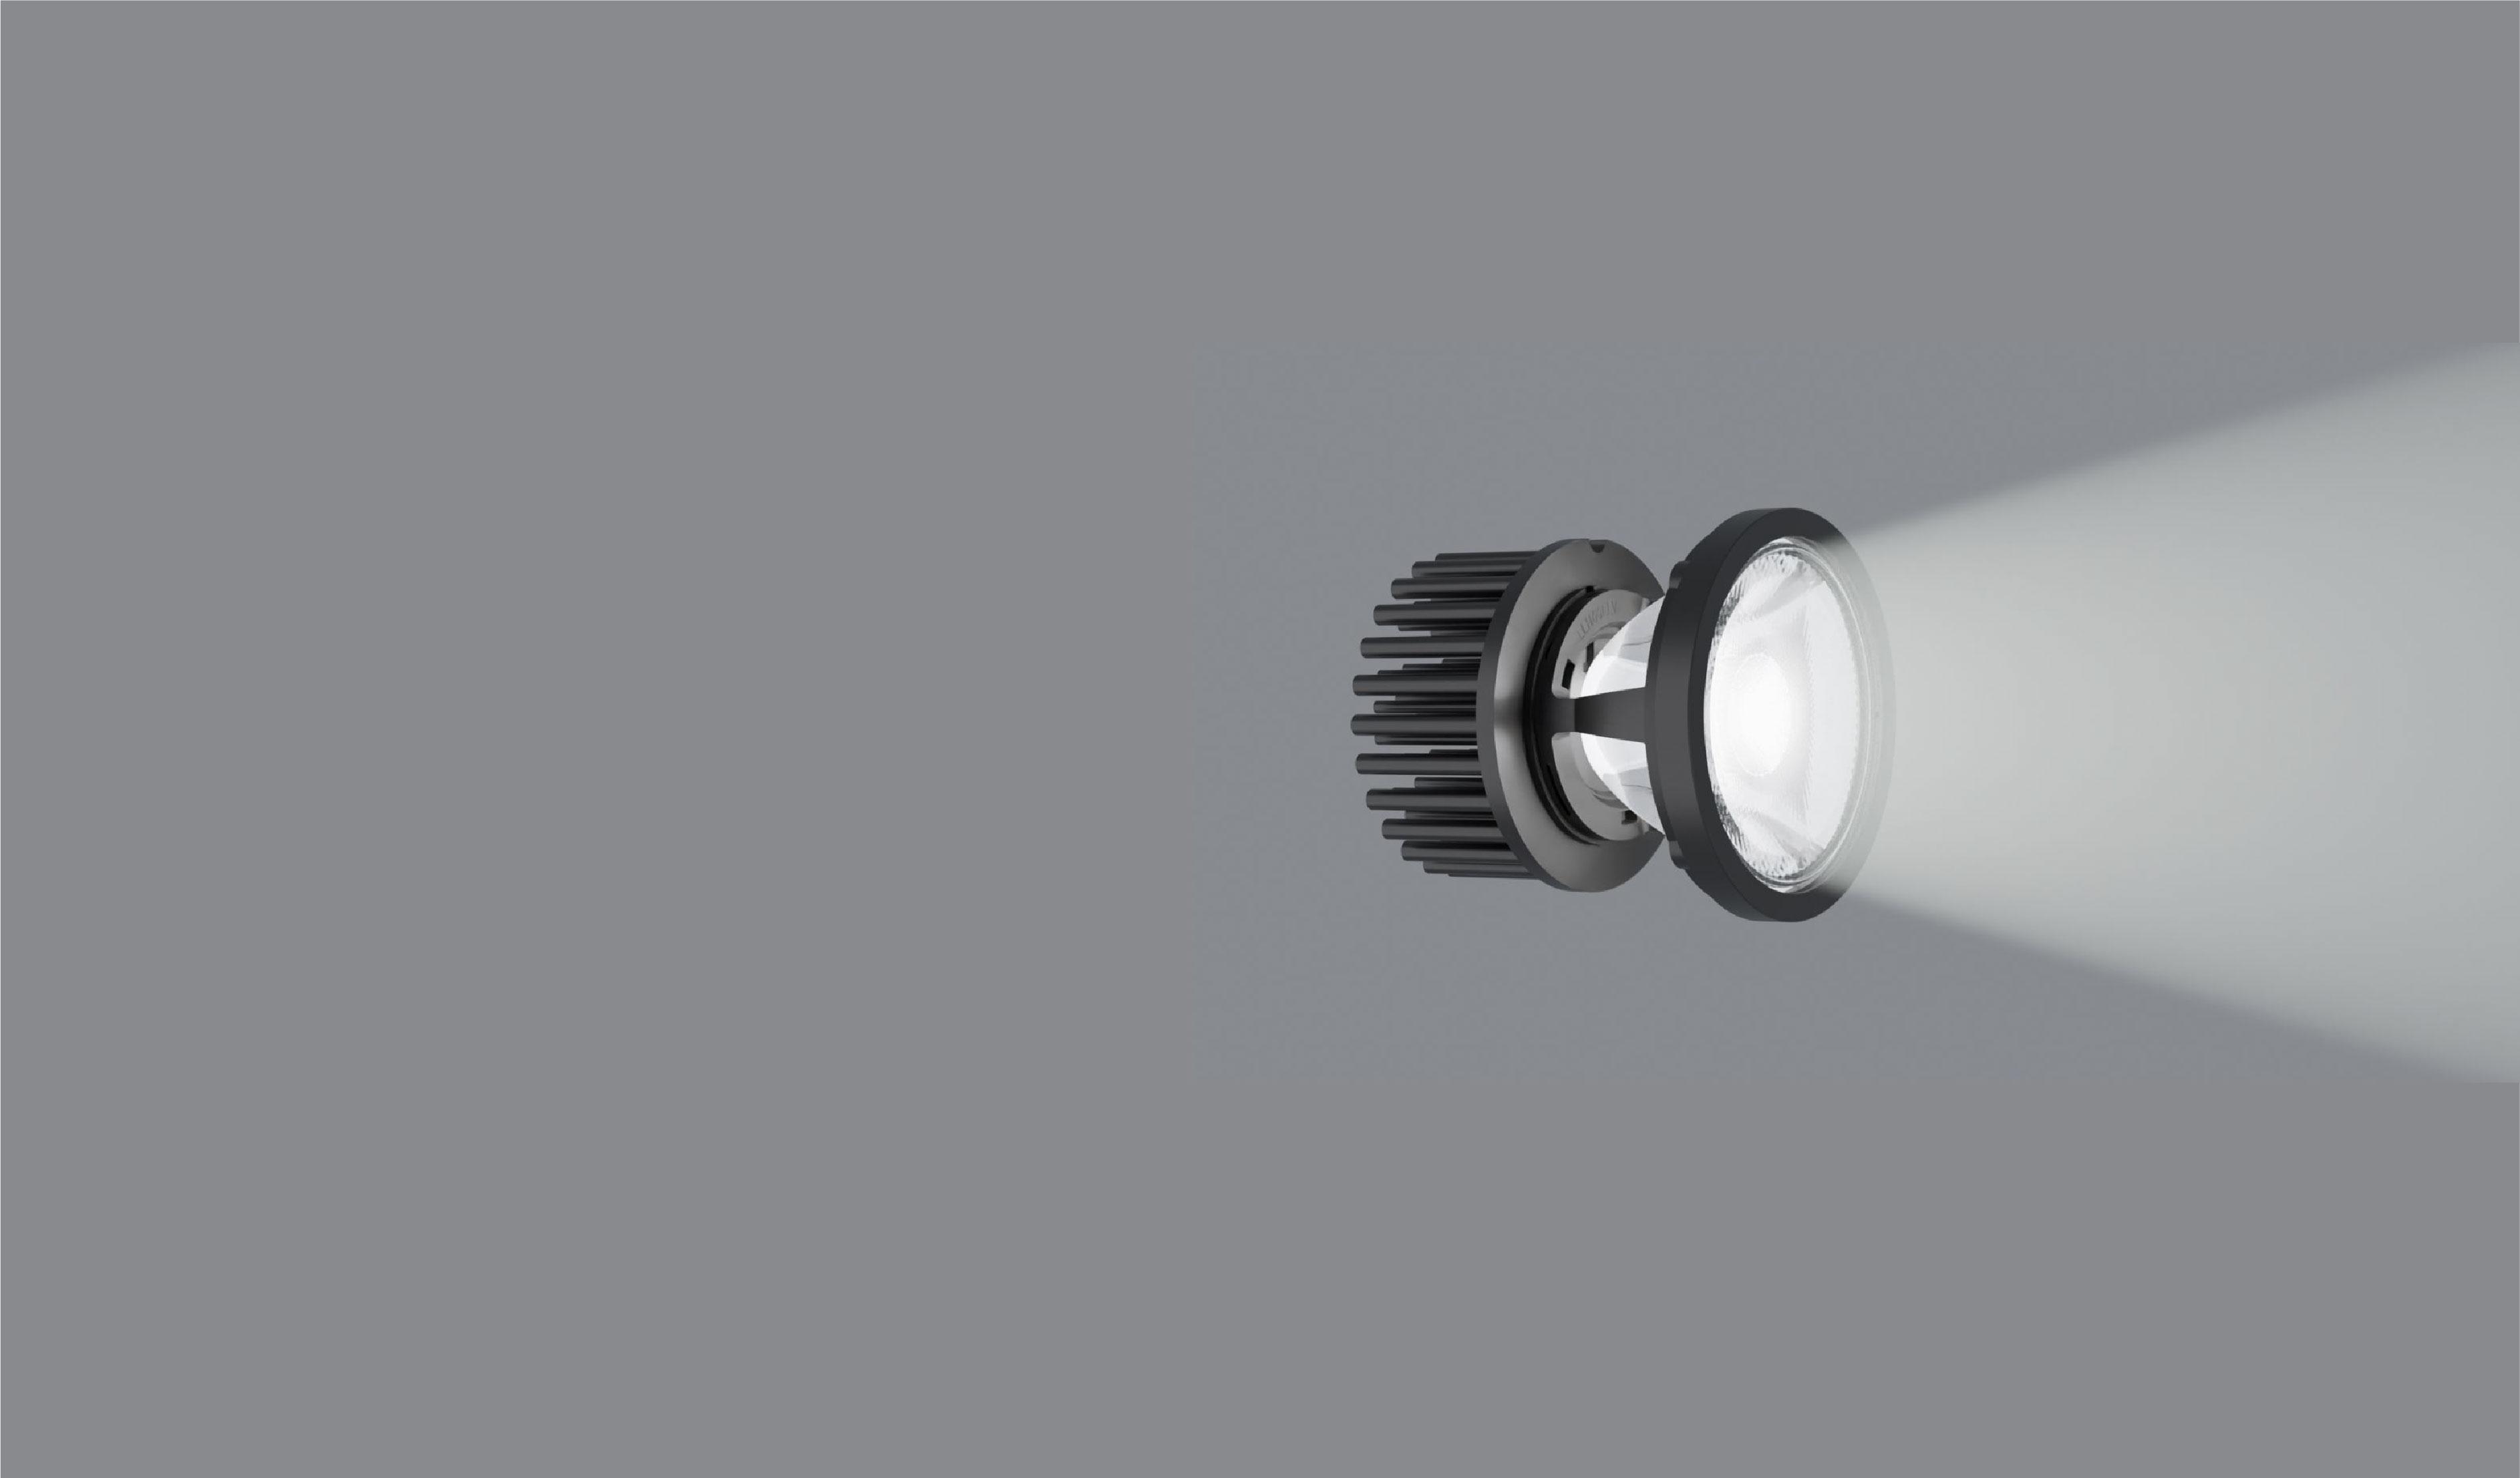 gaggione lensvector lens m2m optic holder collimator